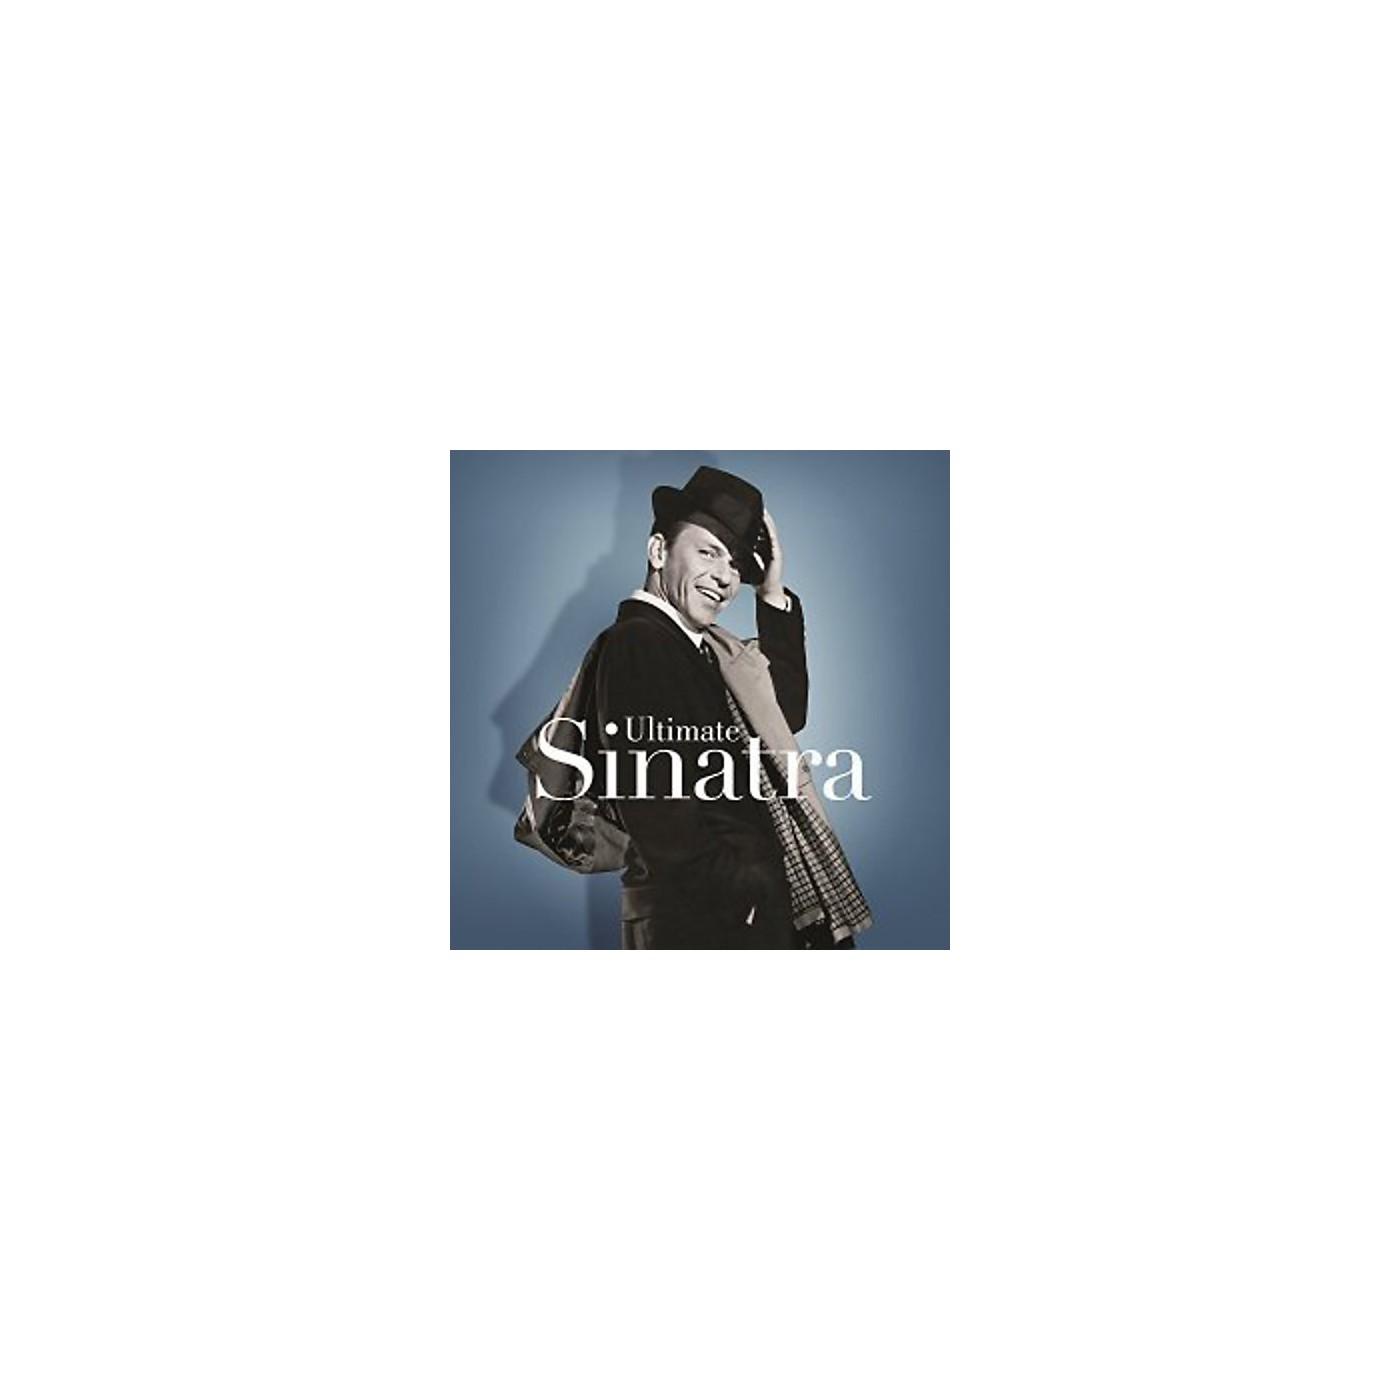 Alliance Frank Sinatra - Ultimate Sinatra (CD) thumbnail